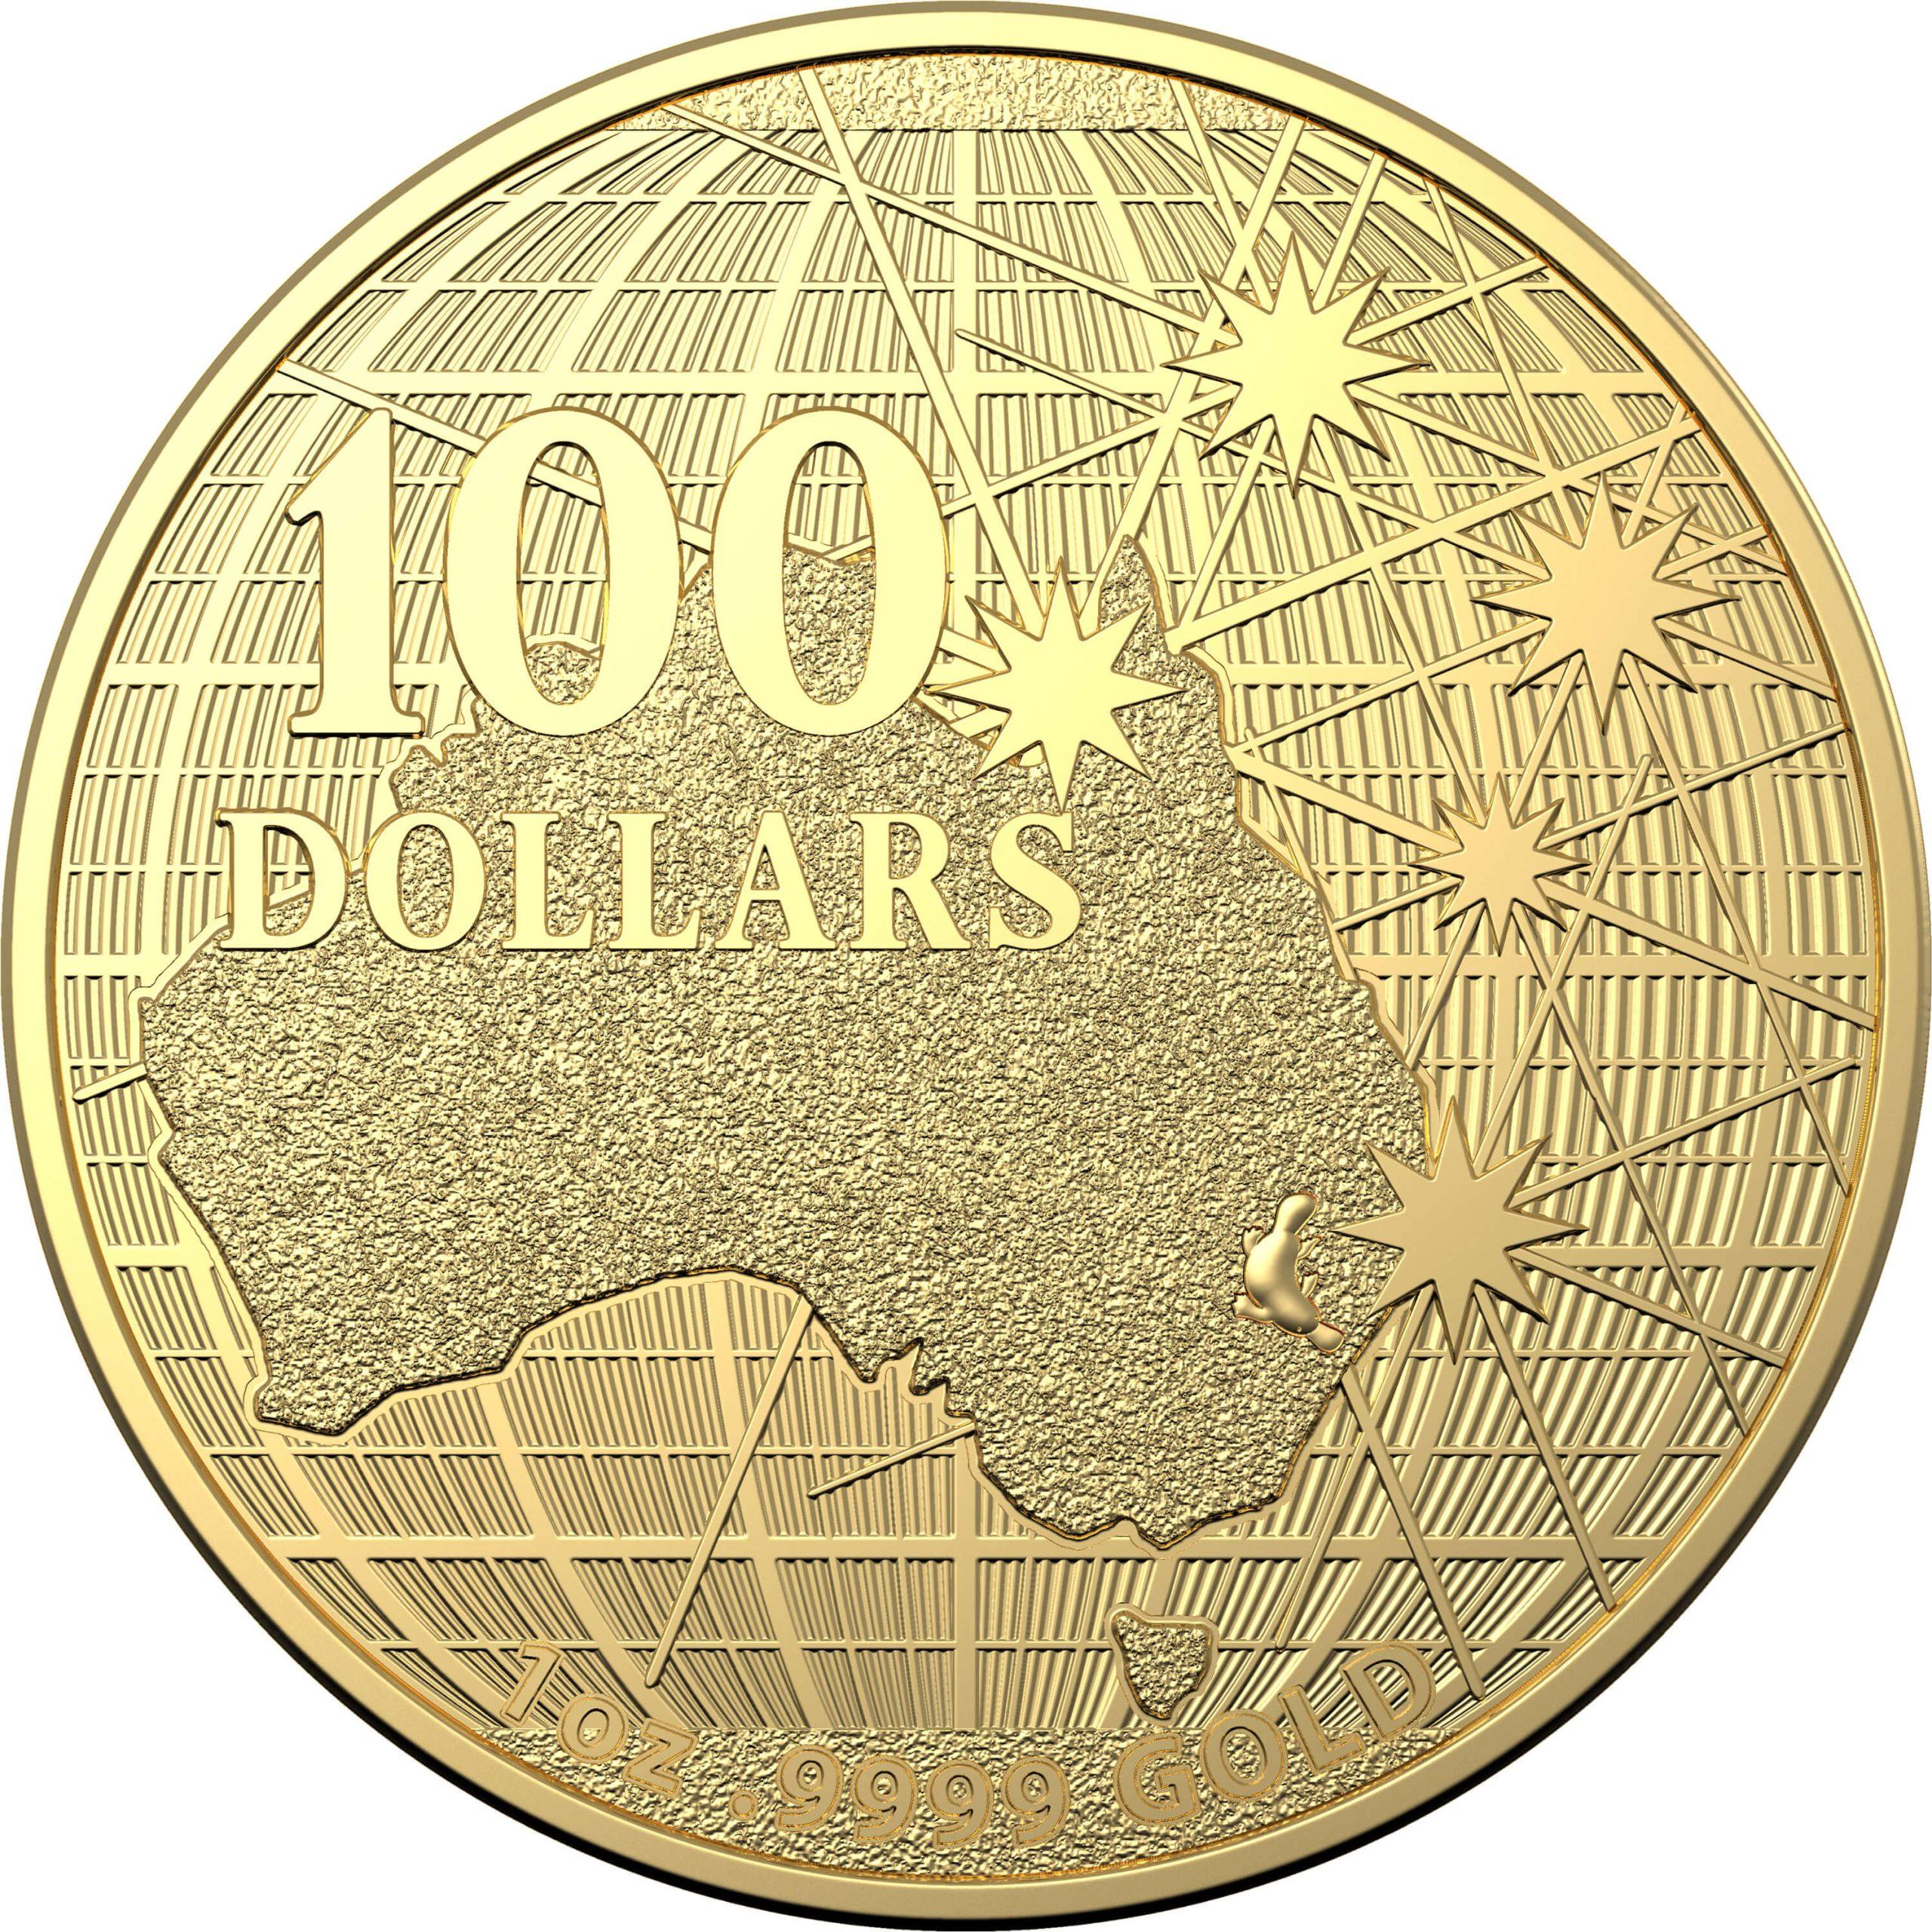 2021 $100 Beneath the Southern Skies 1oz .9999 Gold Bullion Coin - Platypus 1